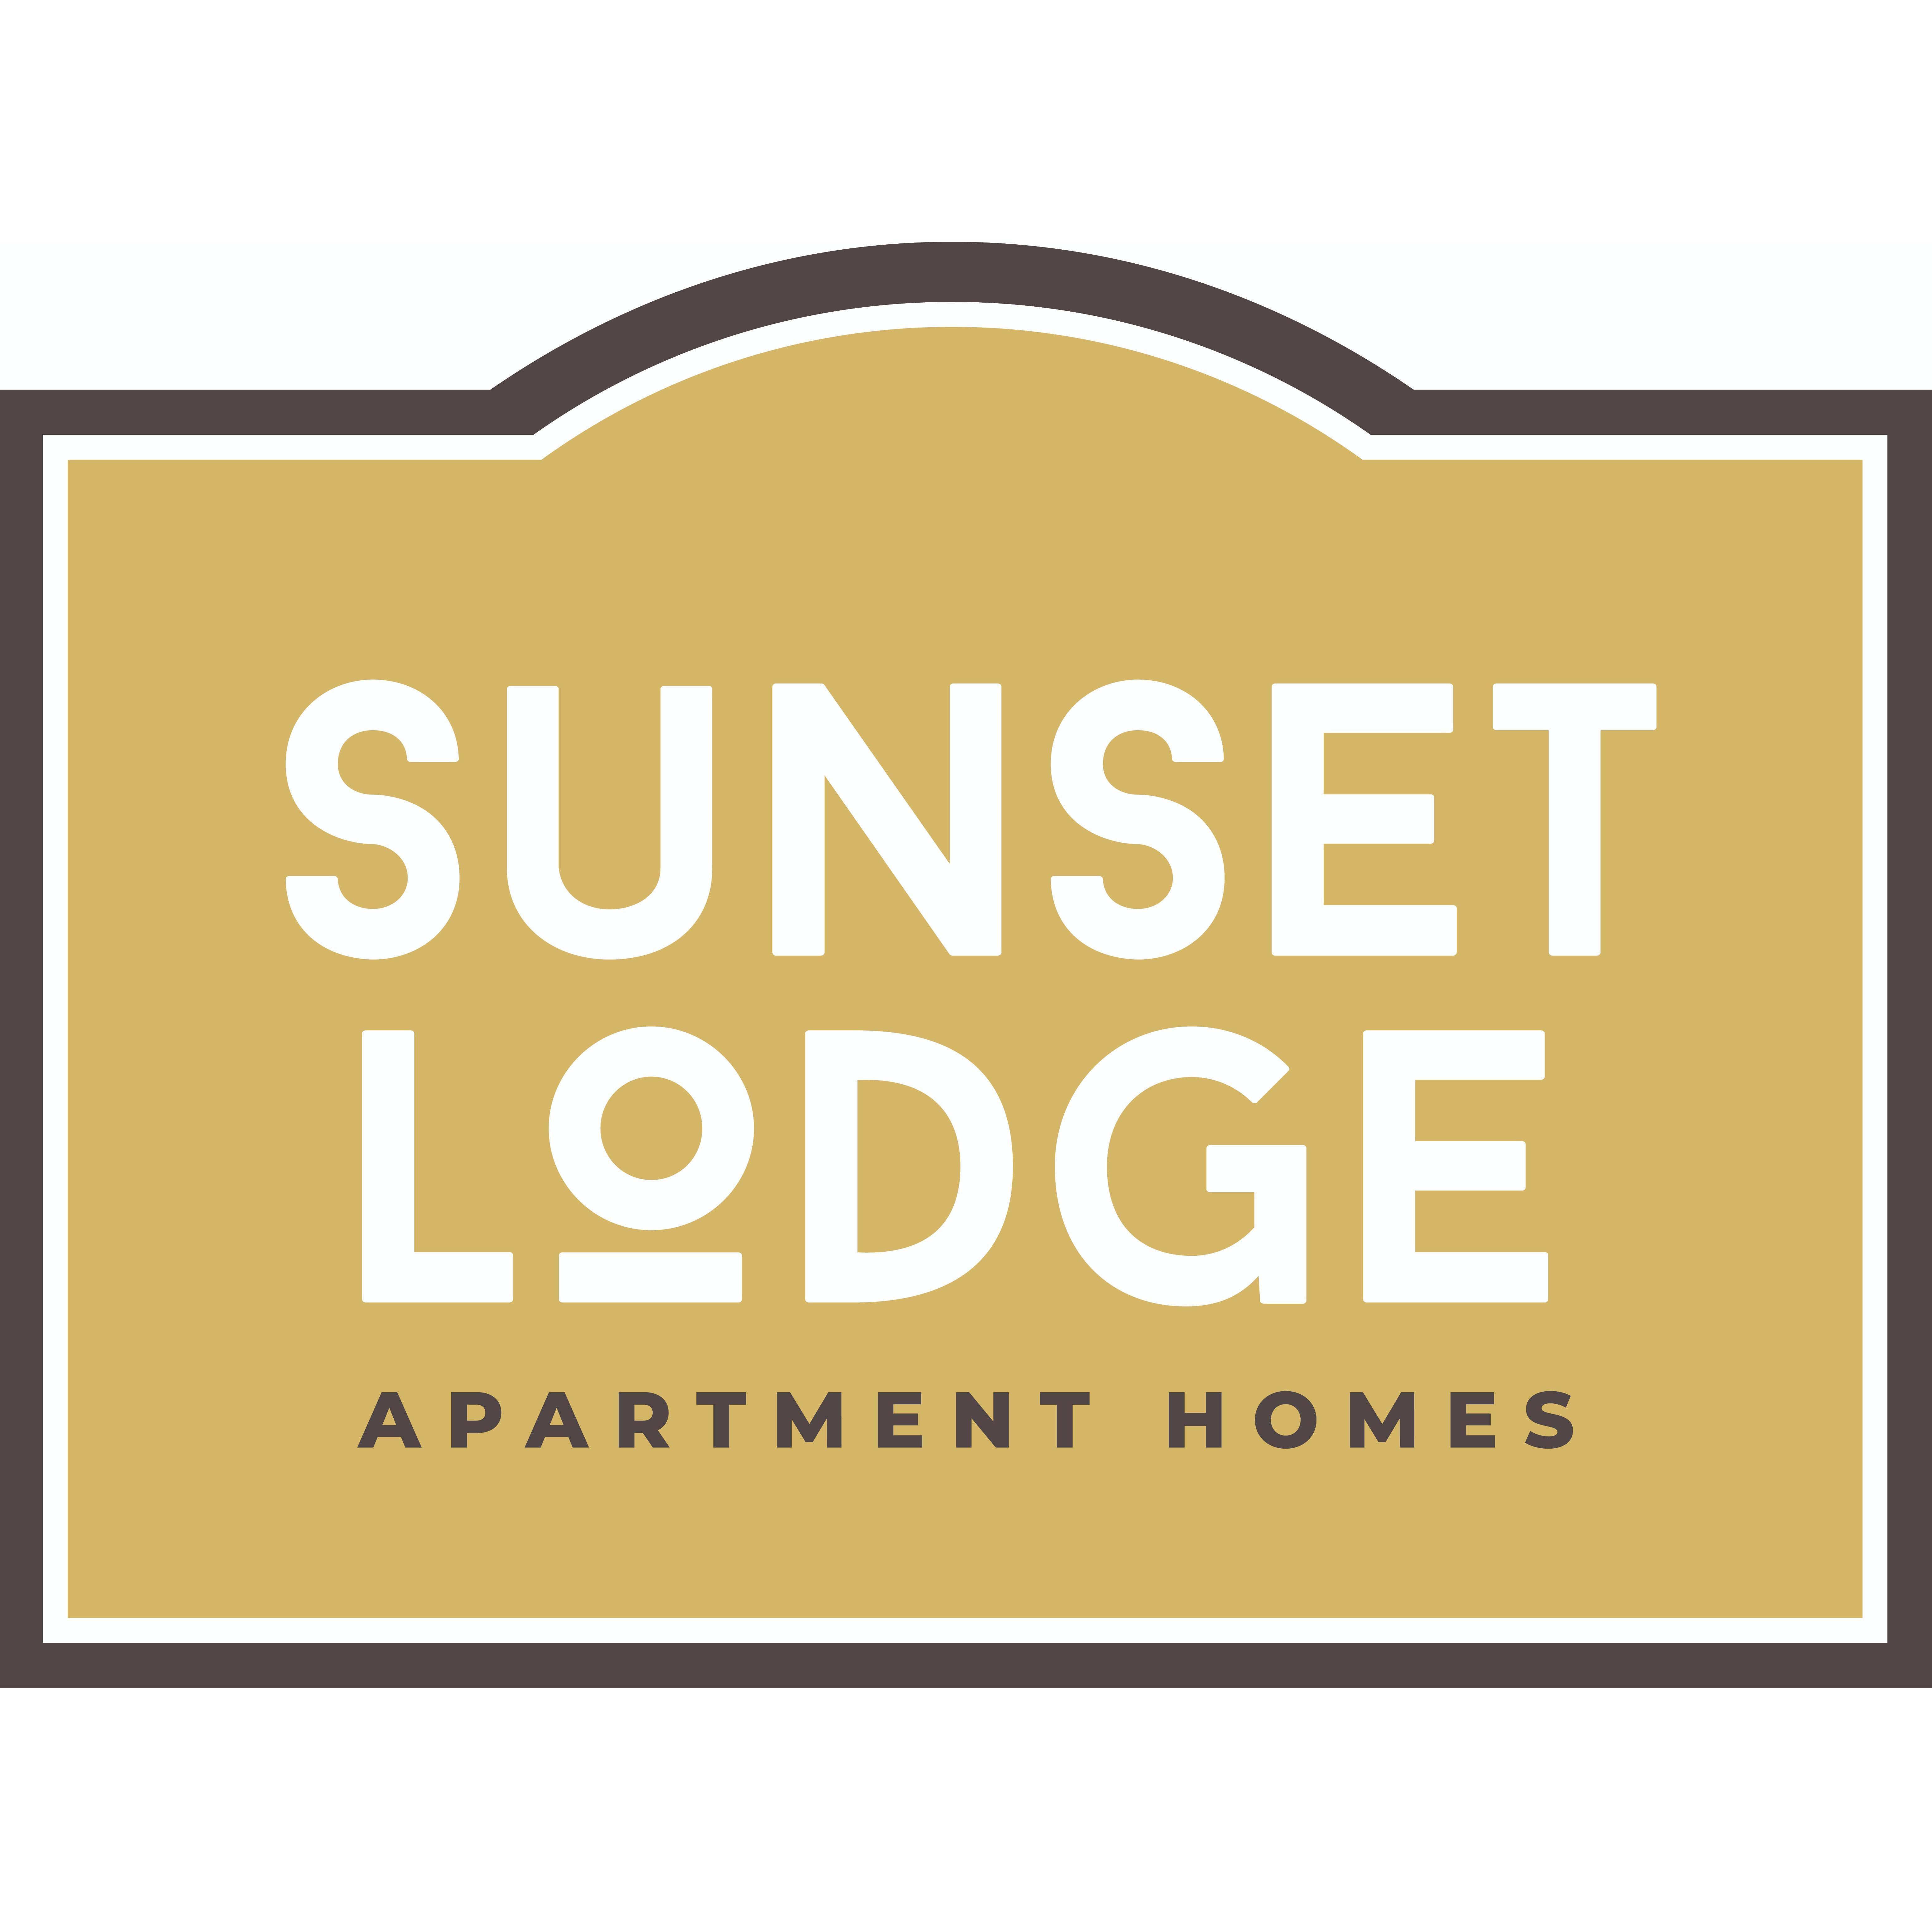 Sunset Lodge Apartment Homes